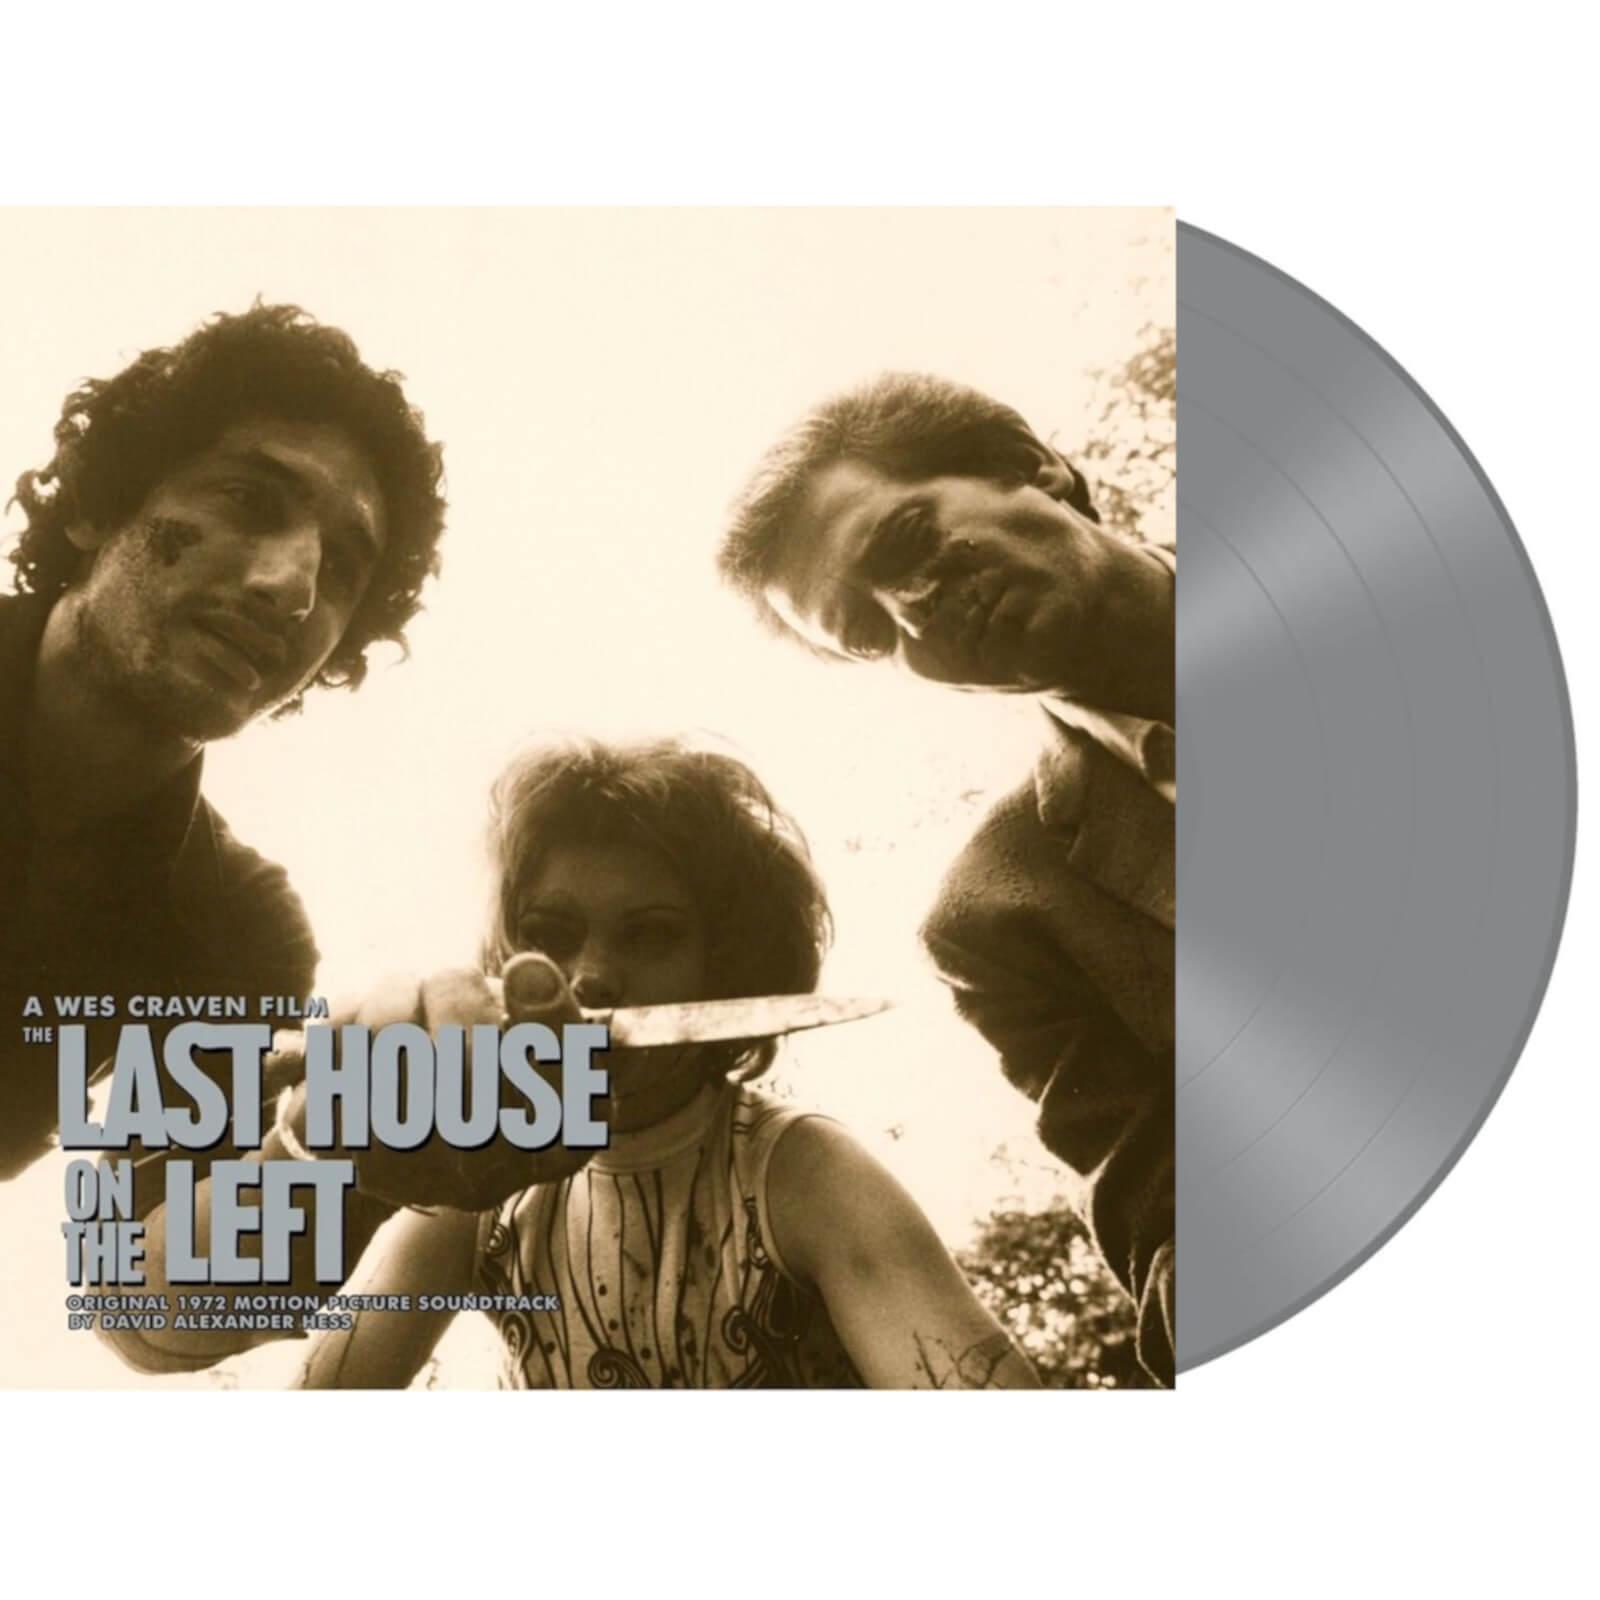 The Last House On The Left Original 1972 Motion Picture Soundtrack Zavvi Exclusive Silver Lp 100 Pieces Worldwide